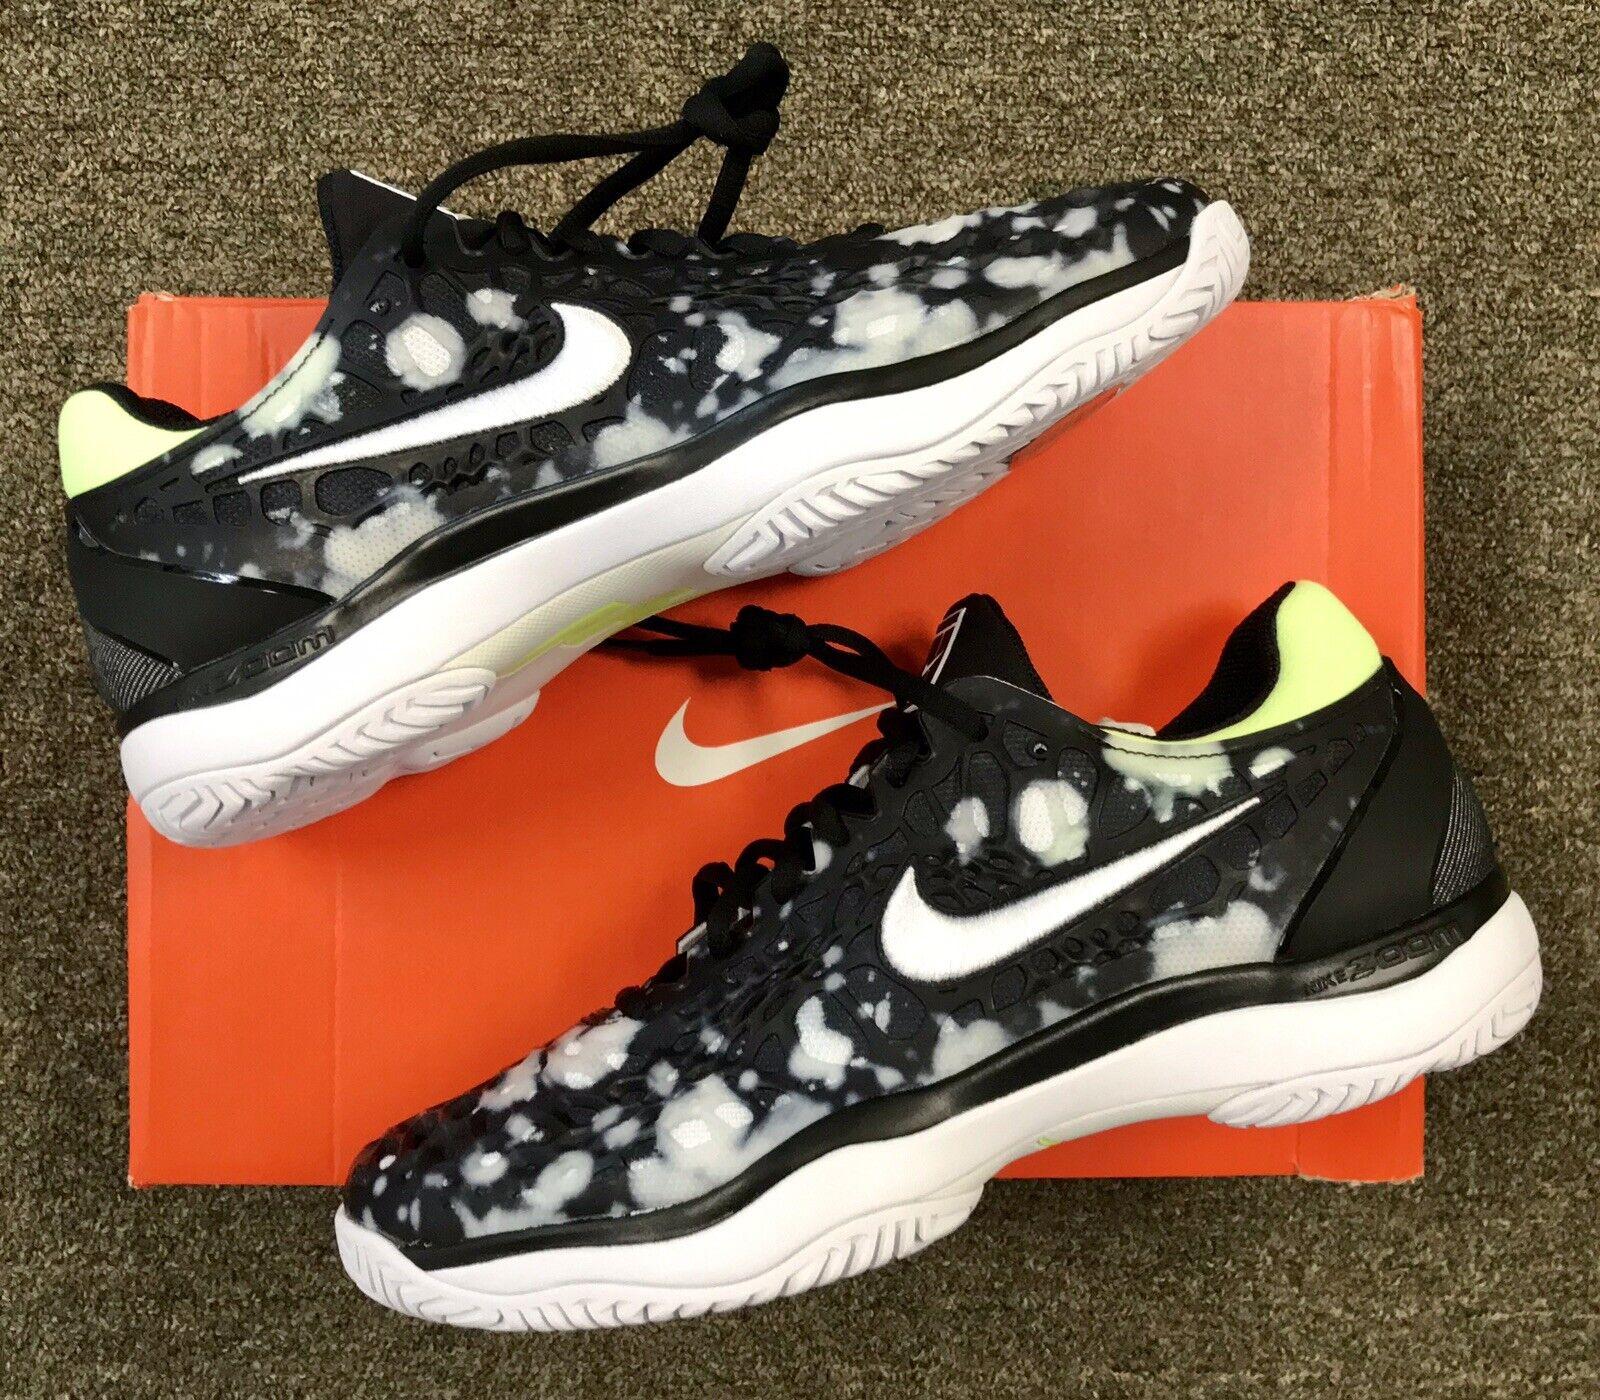 NWT Nike Tennis ZOOM CAGE 3 Men's Tennis shoes  BLACK WHITE VOLT GLOW  9   130